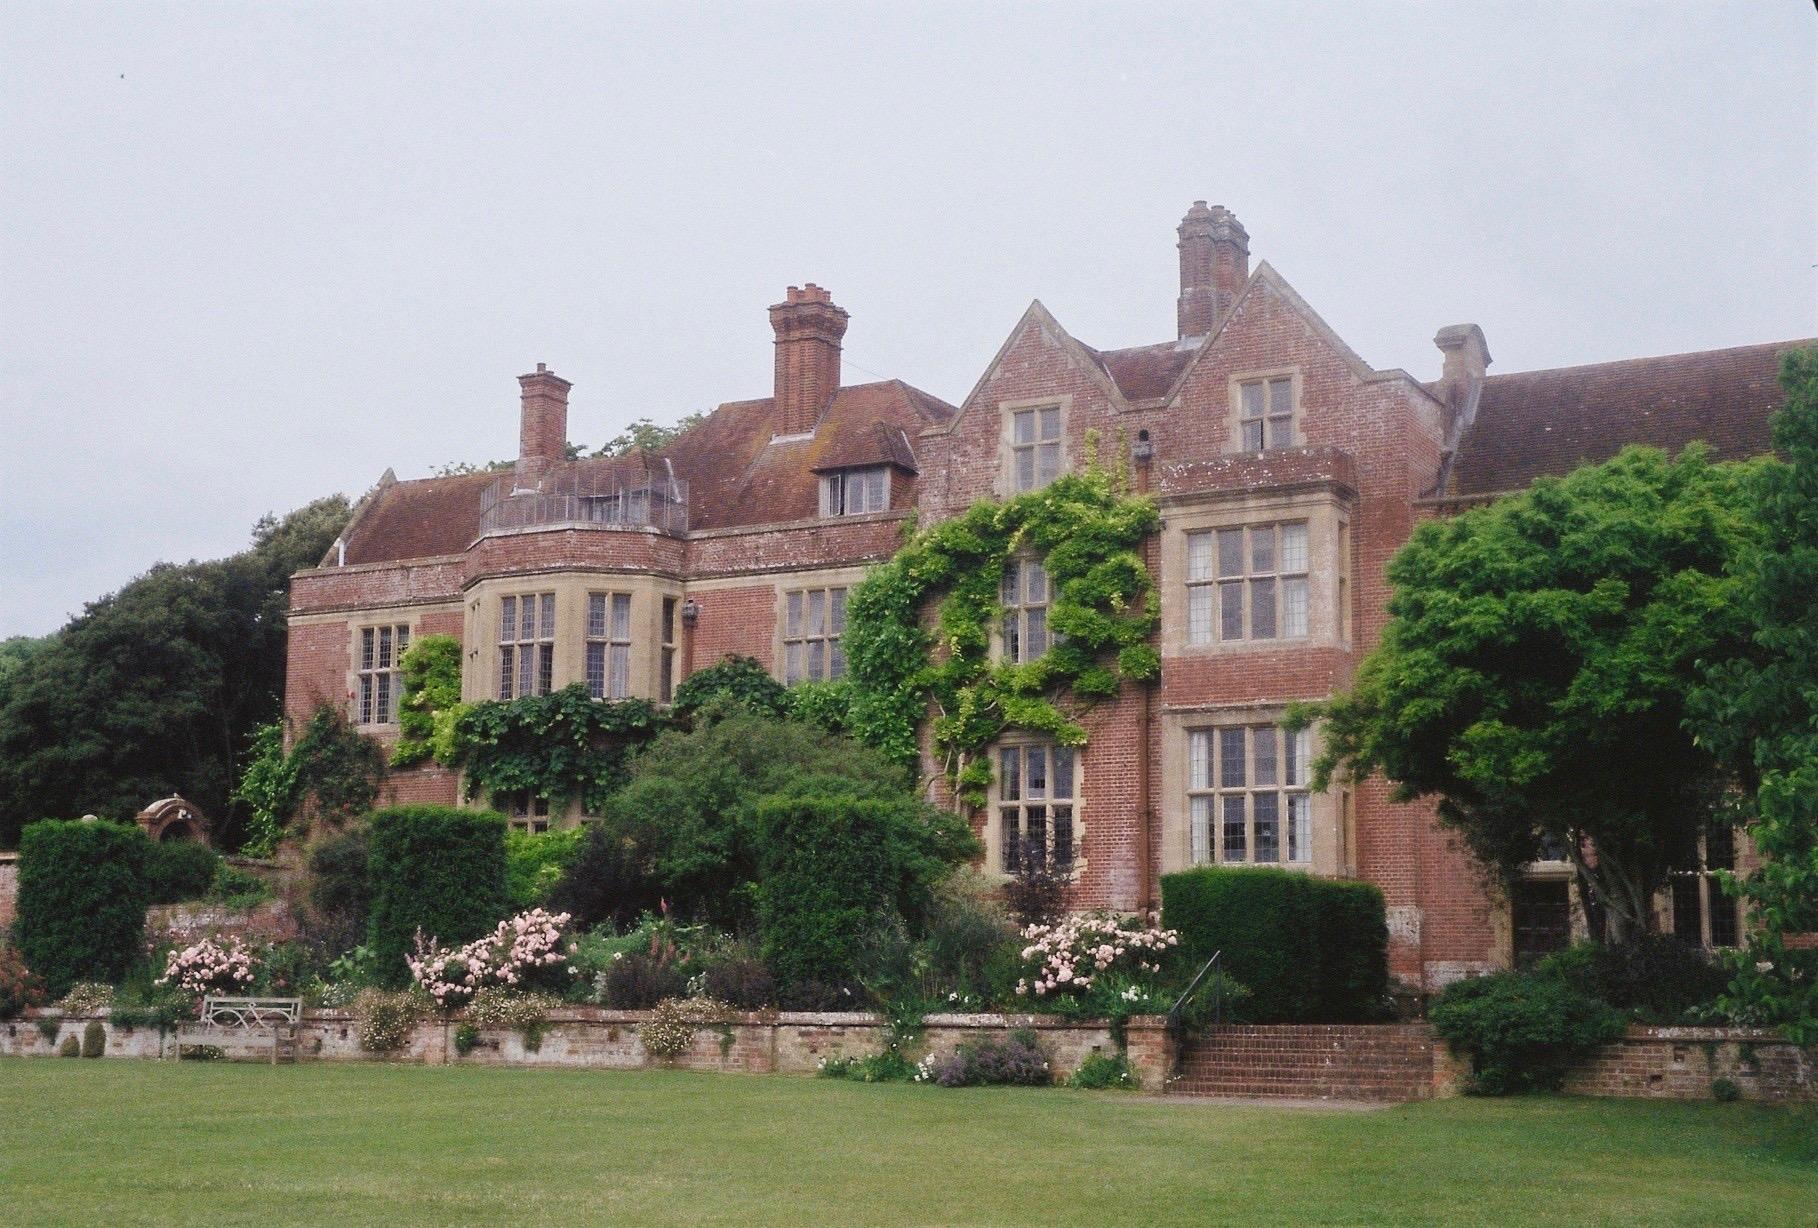 Glyndebourne House